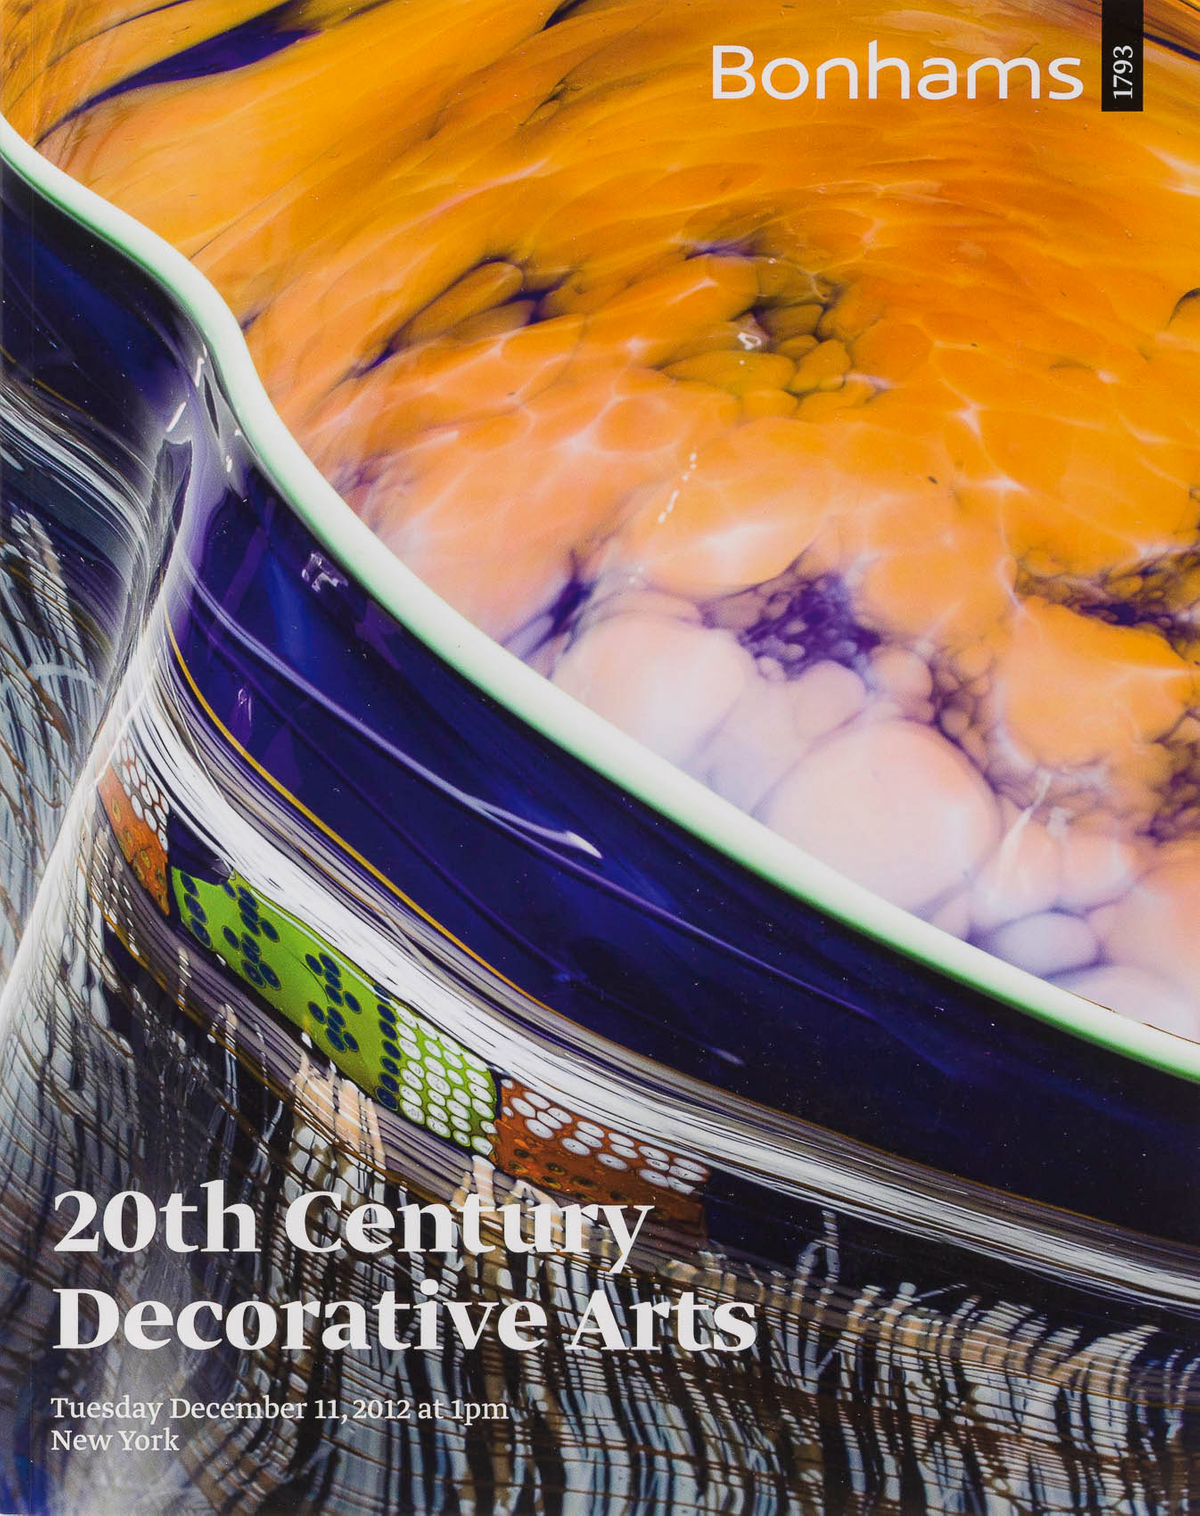 9-2012-12-Bonhams-20th-CentDec-Arts.jpg